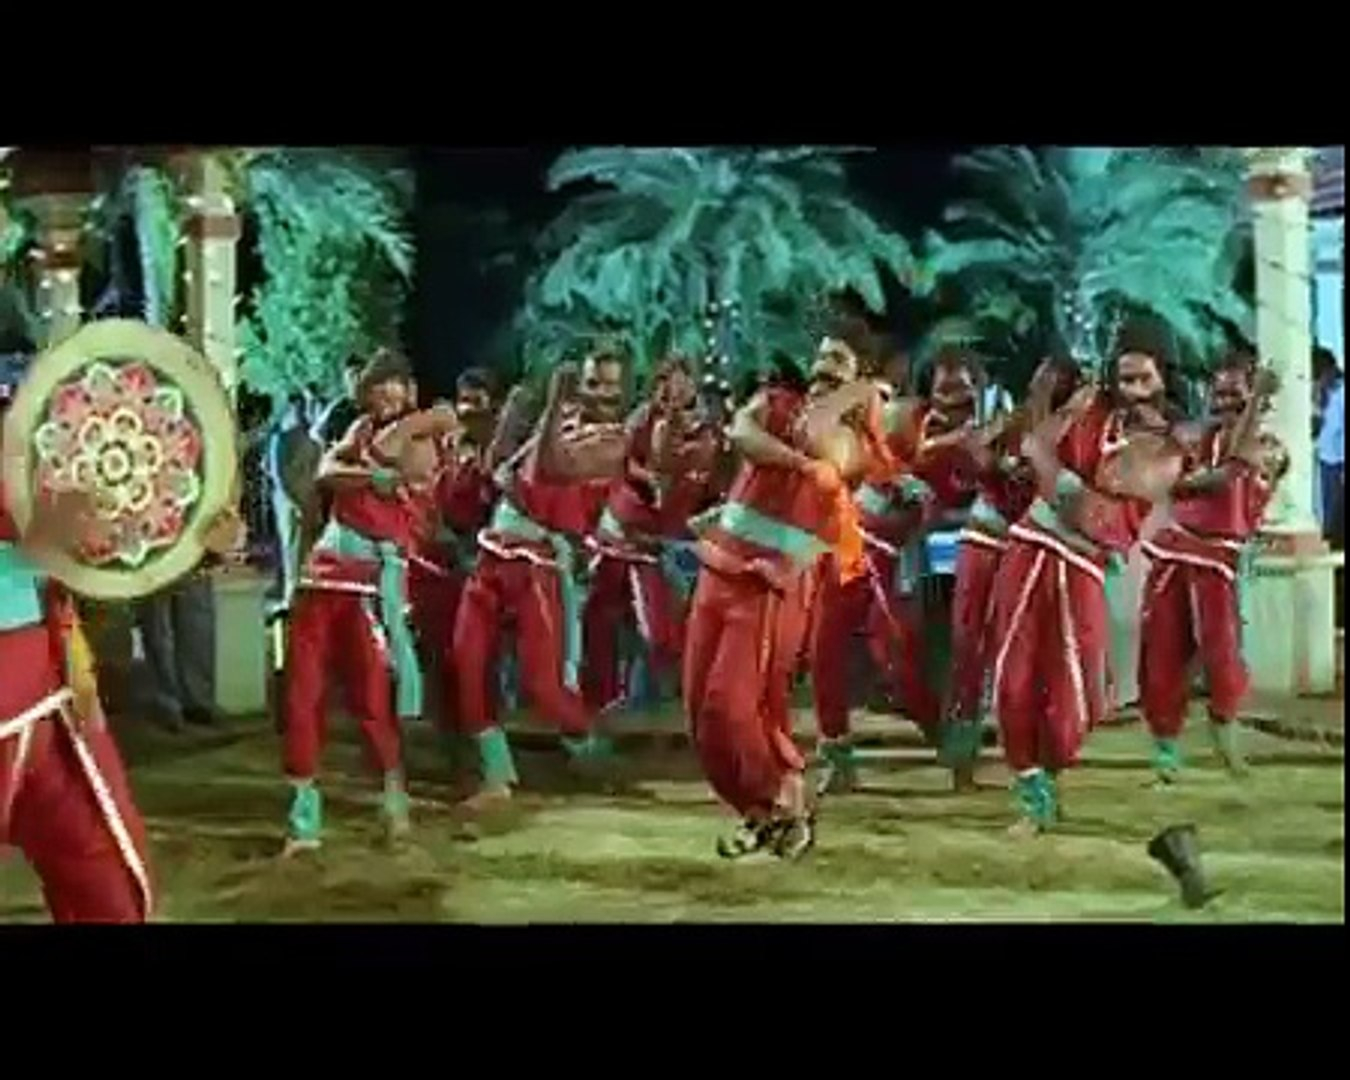 Hindi Movies 2015 Full Movie - Mera Akhiri Faisla Full Movie - Hindi Dubbed Action Movie 2015 - YouT